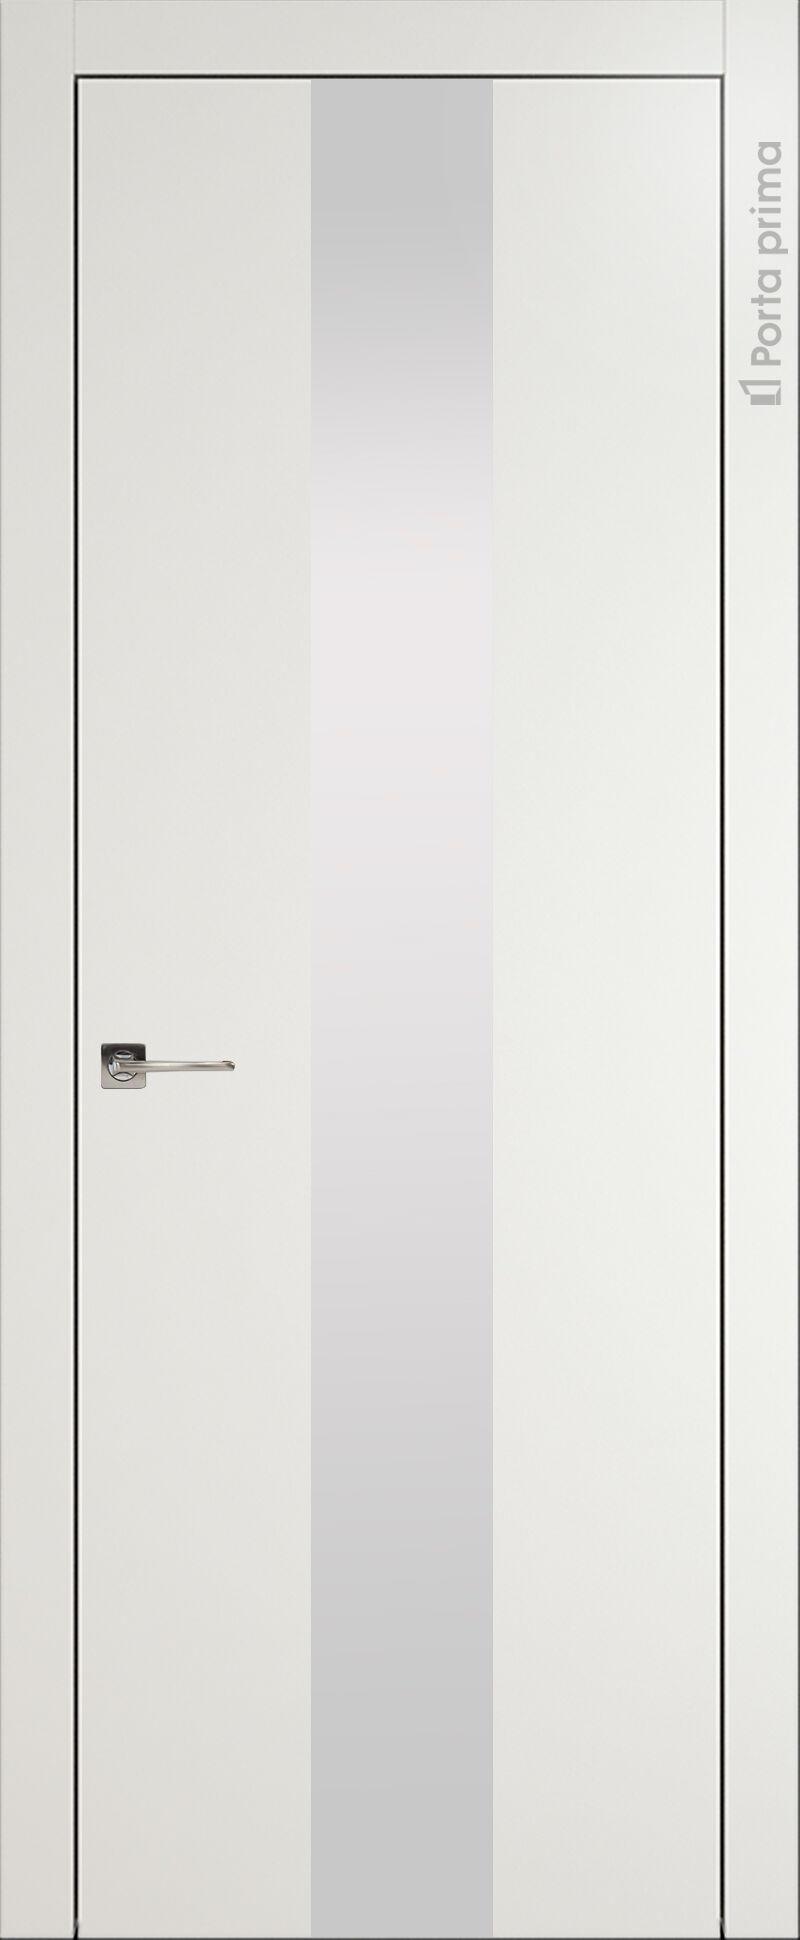 Tivoli Ж-5 цвет - Бежевая эмаль (RAL 9010) Со стеклом (ДО)